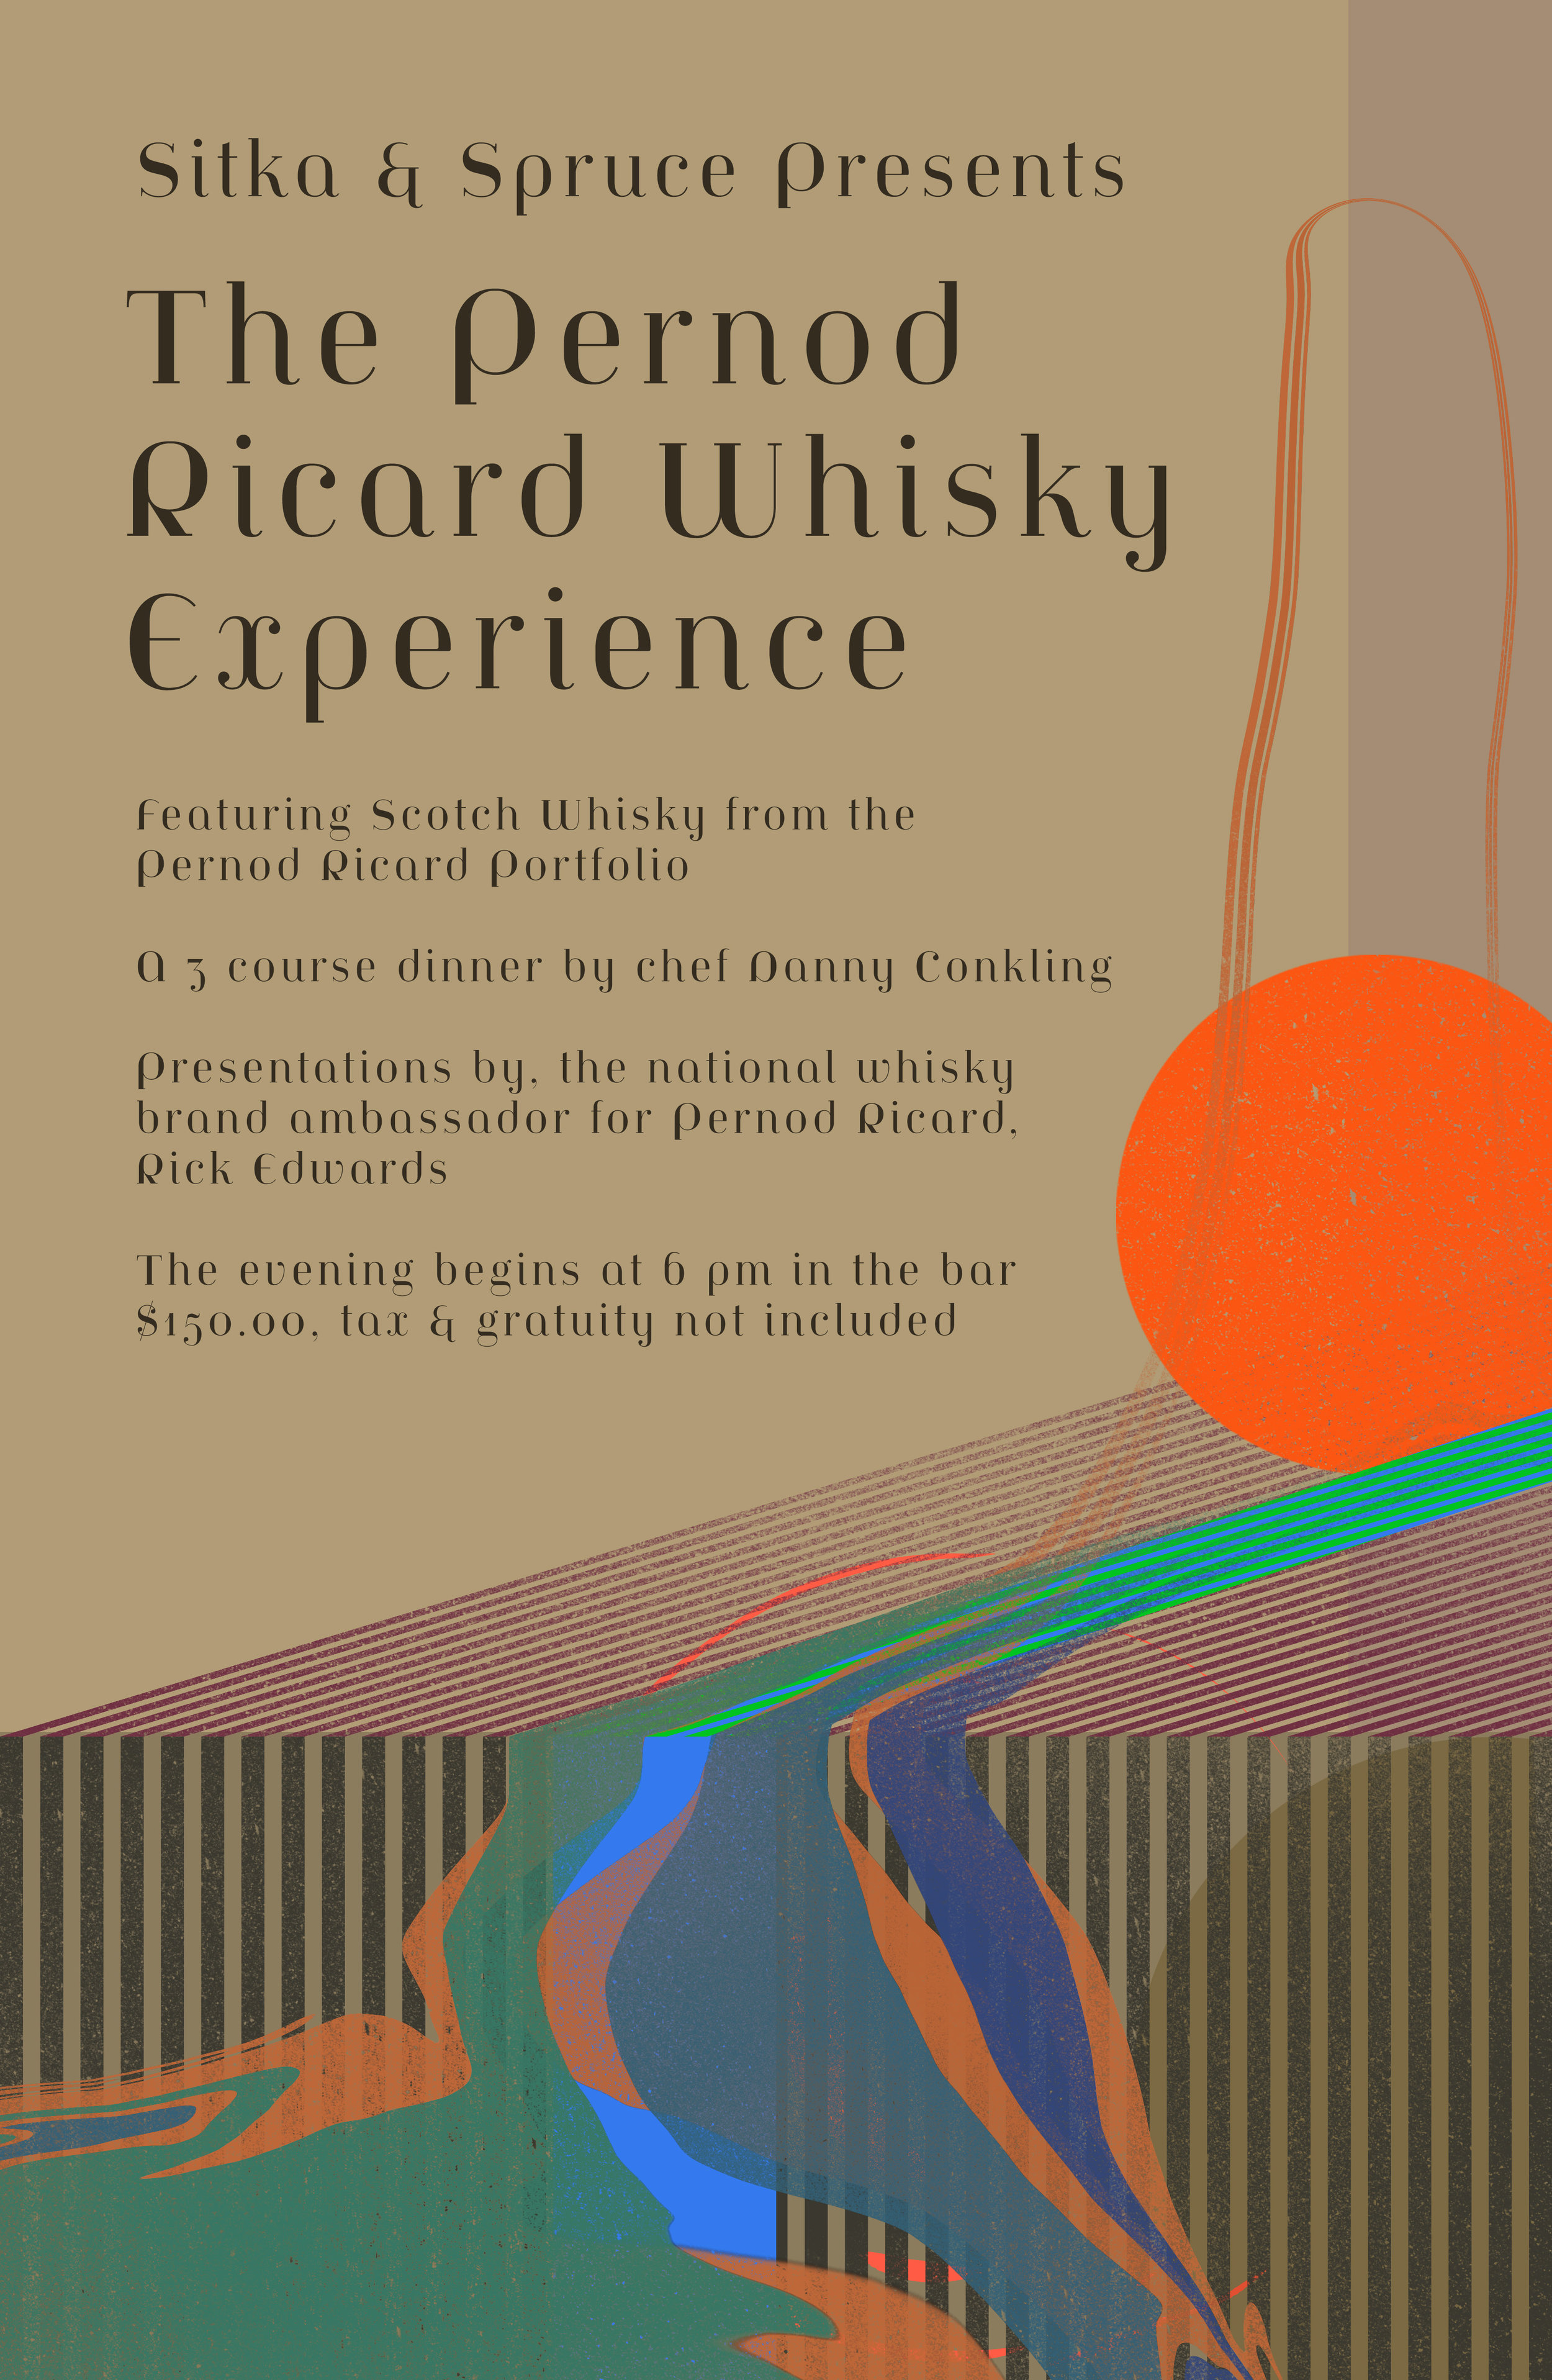 SS-Scotch Dinner-April 2019-Poster.jpg